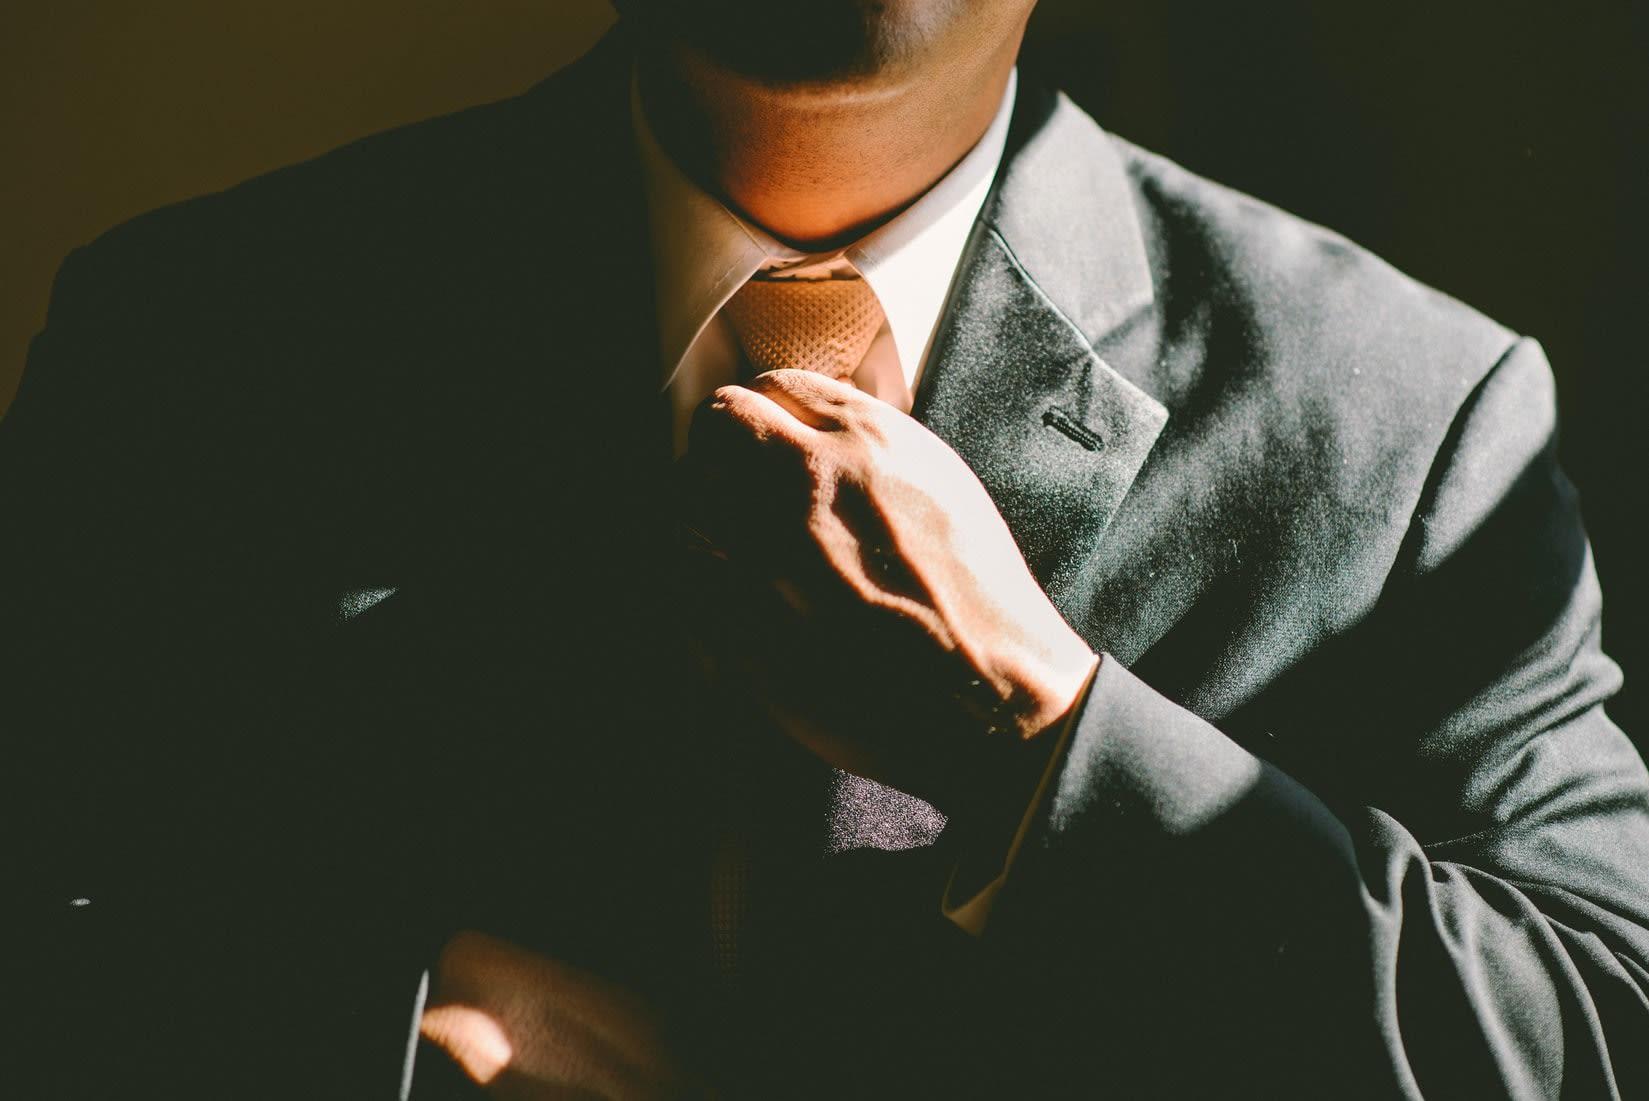 Yang Perlu Anda Ketahui Tentang Bos Kasino